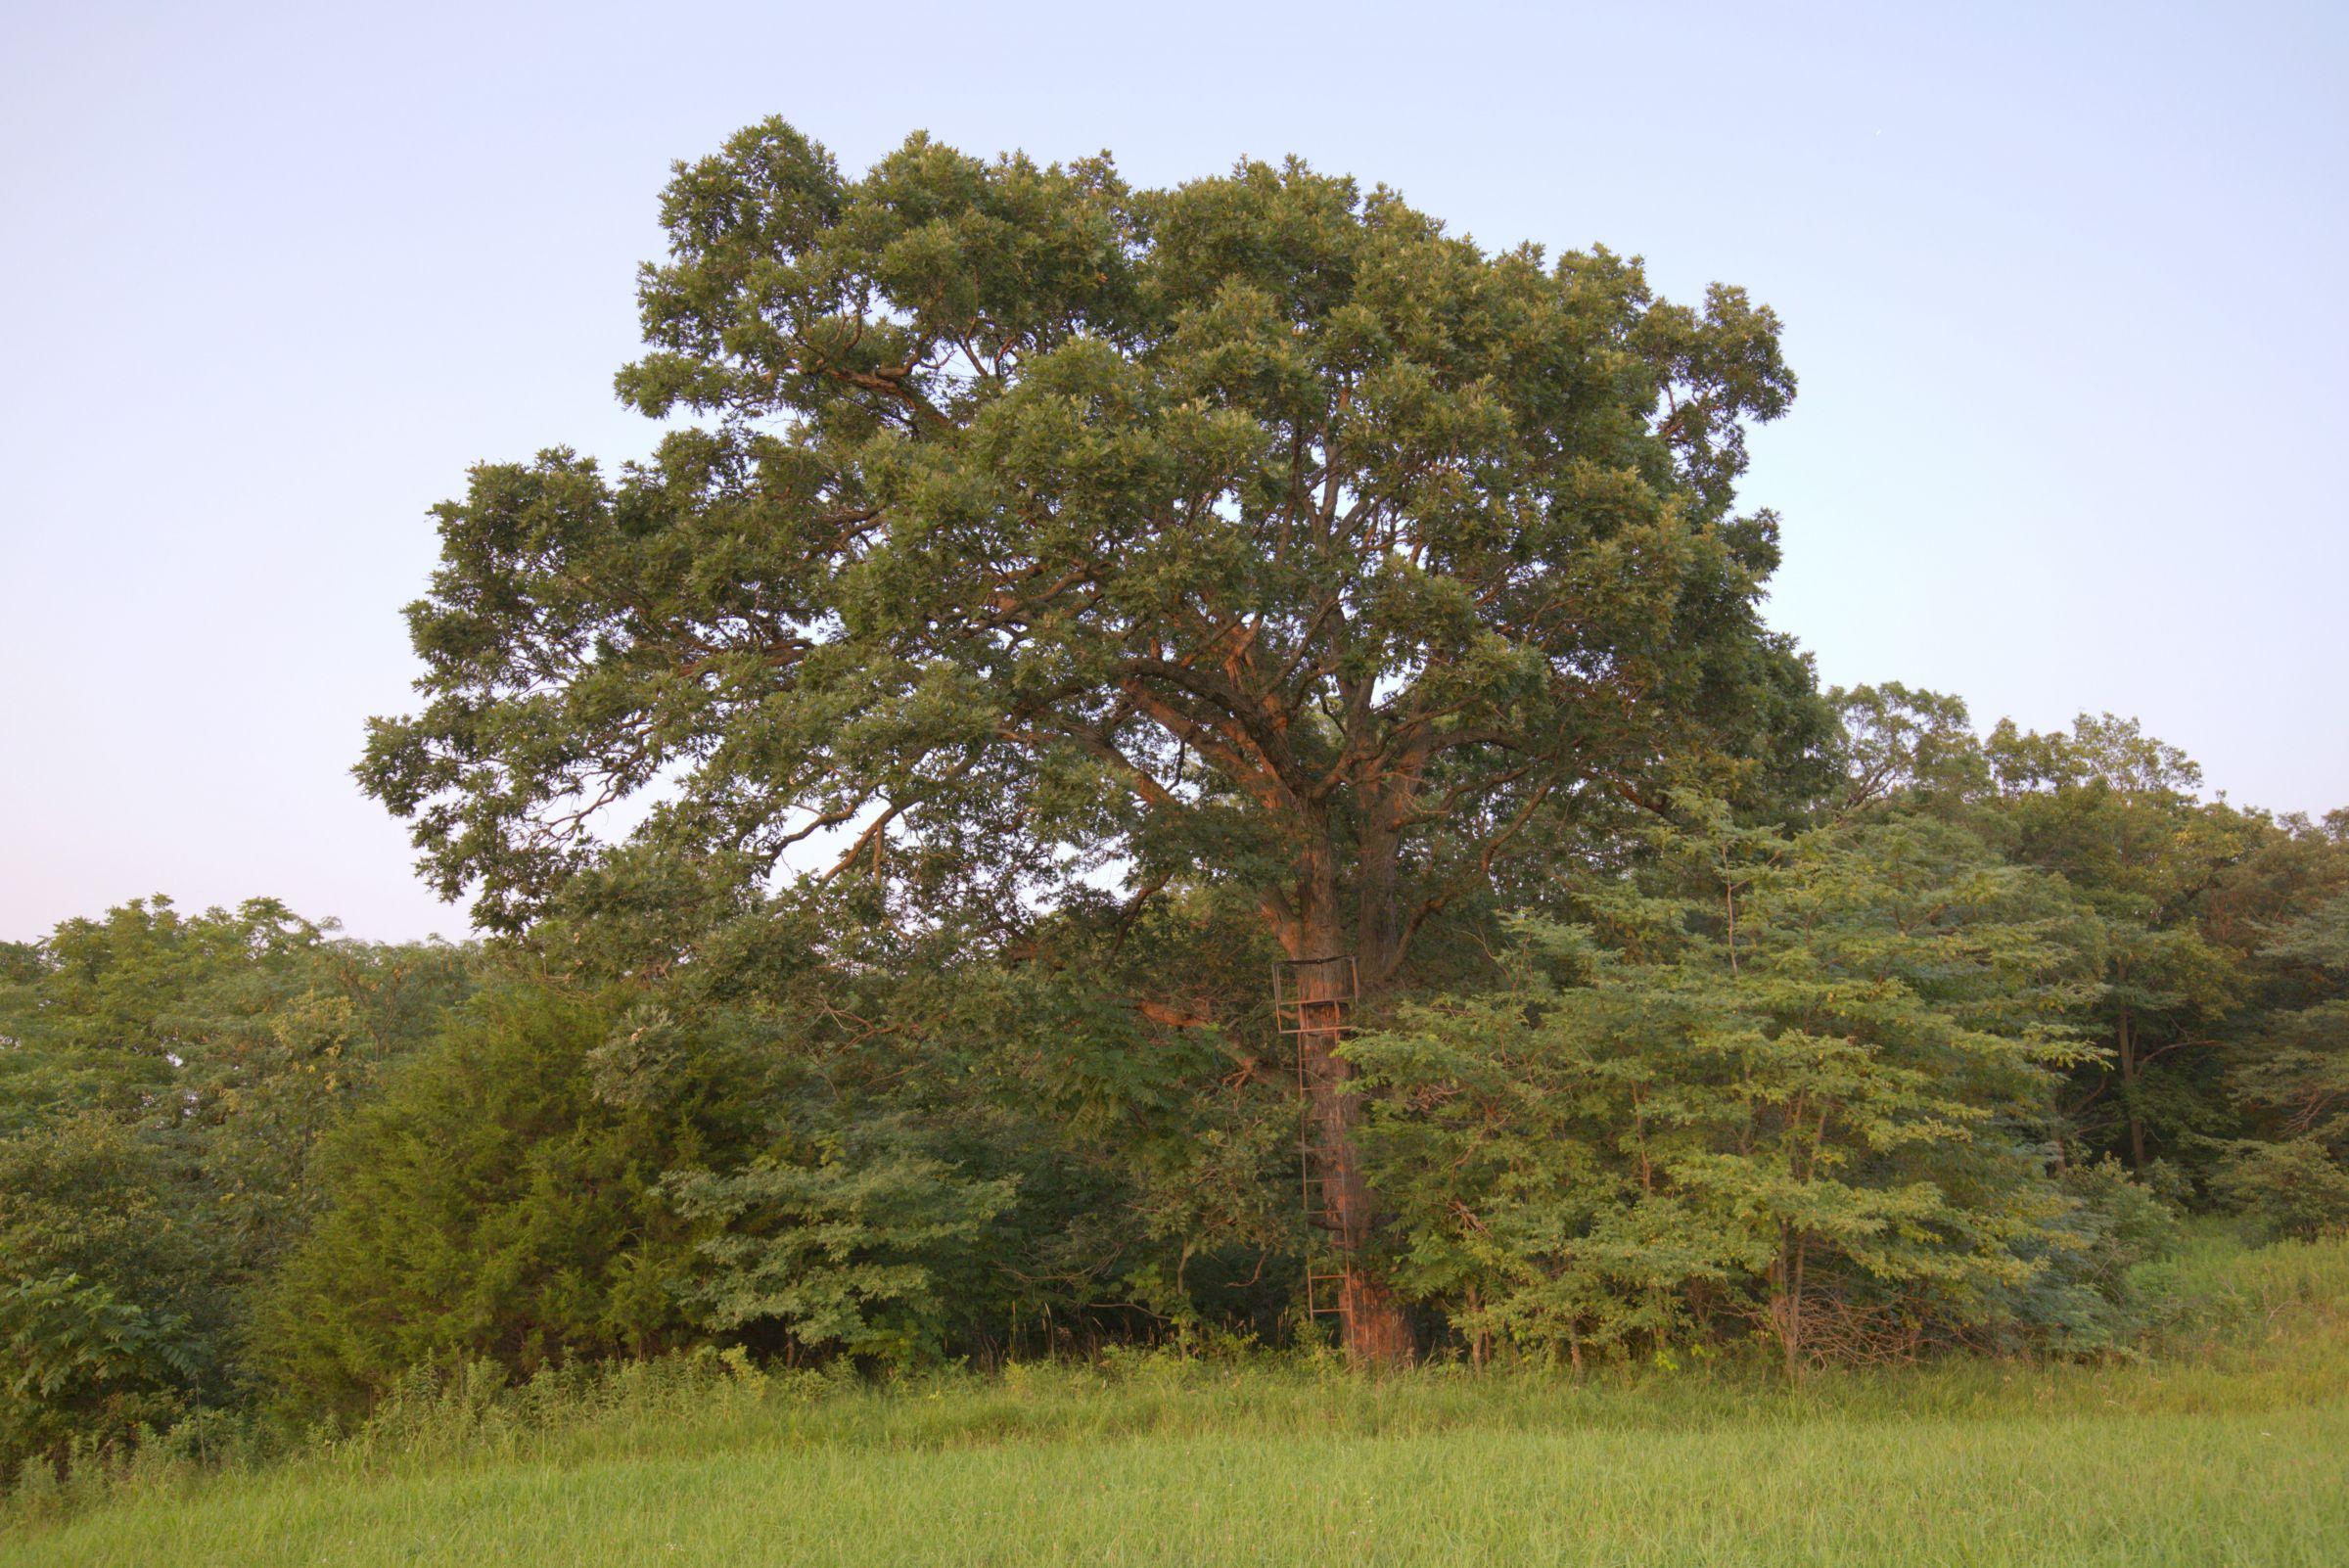 land-lee-county-iowa-340-acres-listing-number-15649-5-2021-07-21-185151.jpg